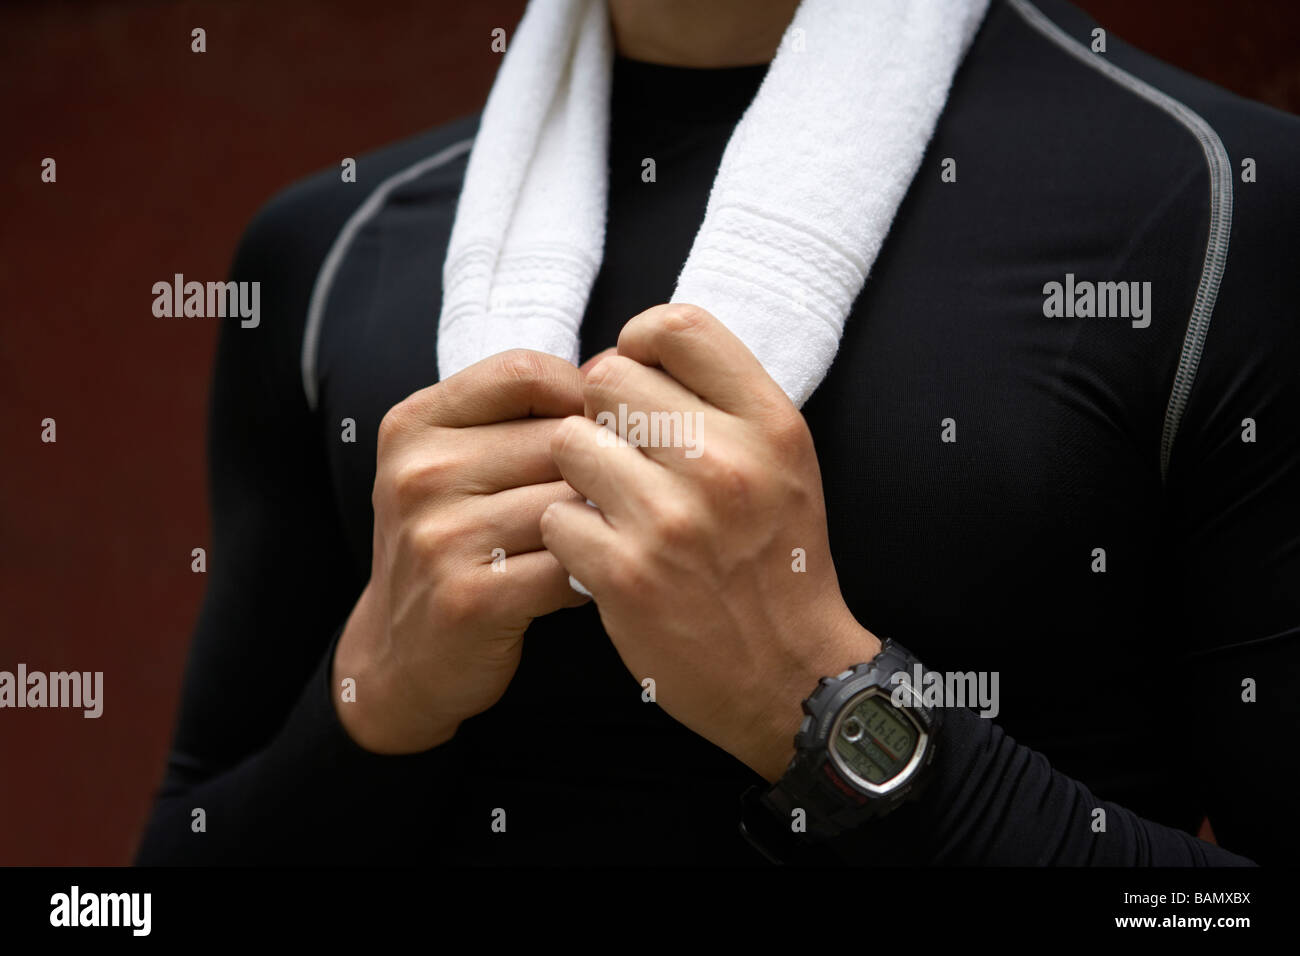 Close Up Of Athlete - Stock Image